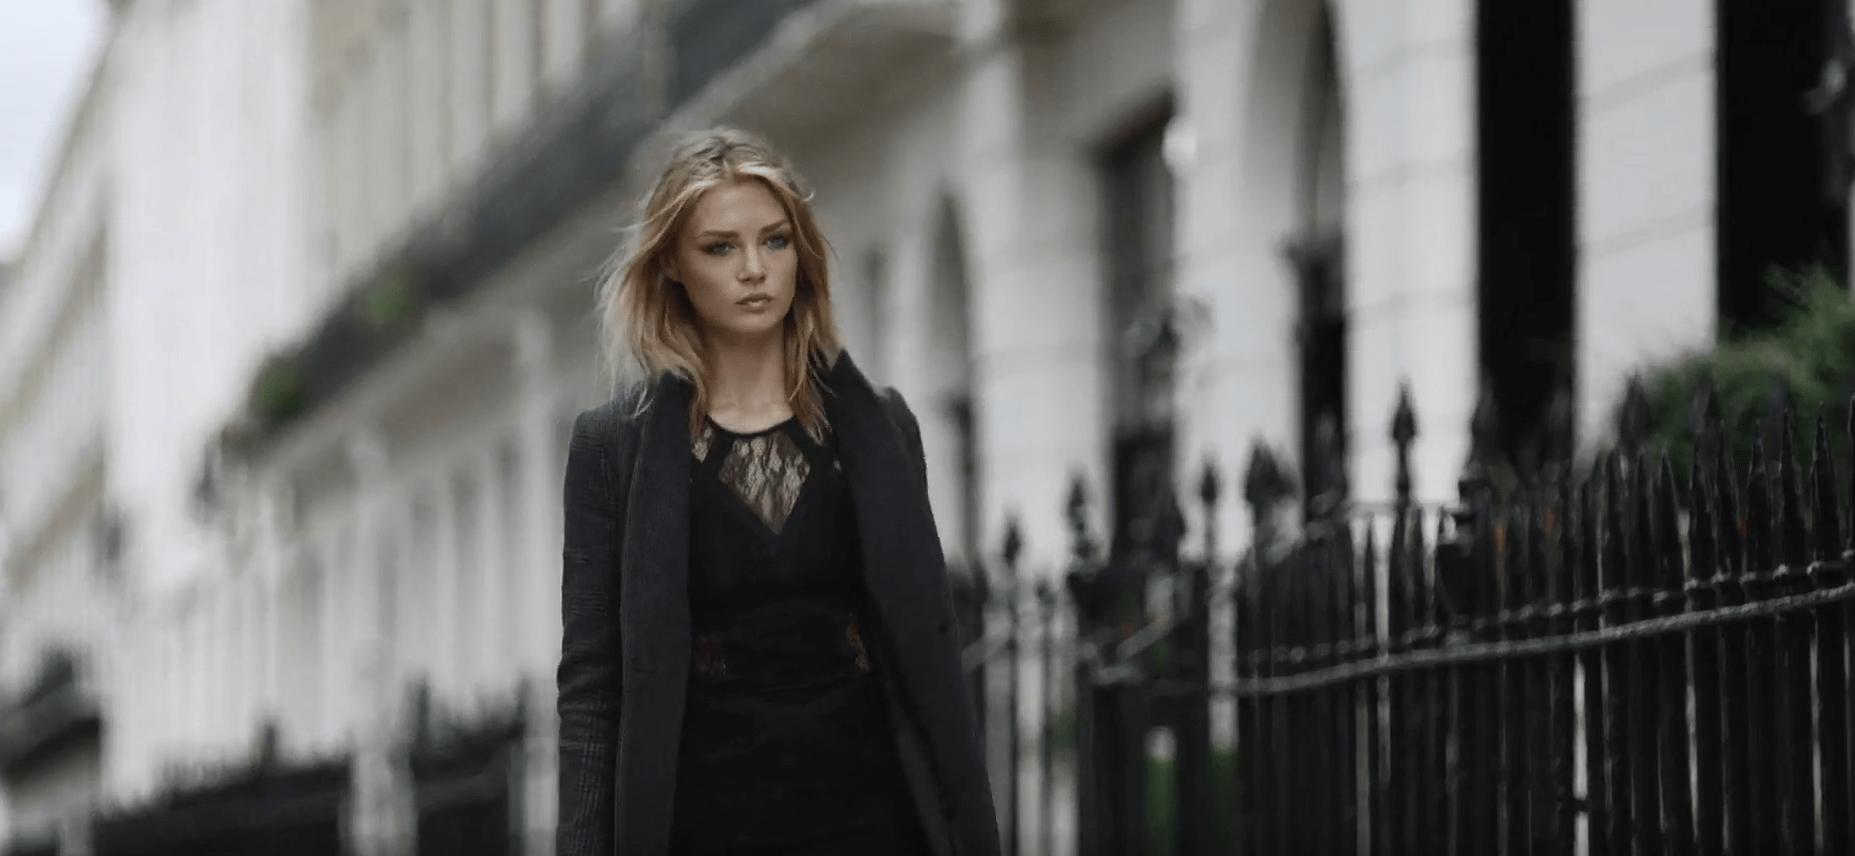 All Saint Fashion Stylist London